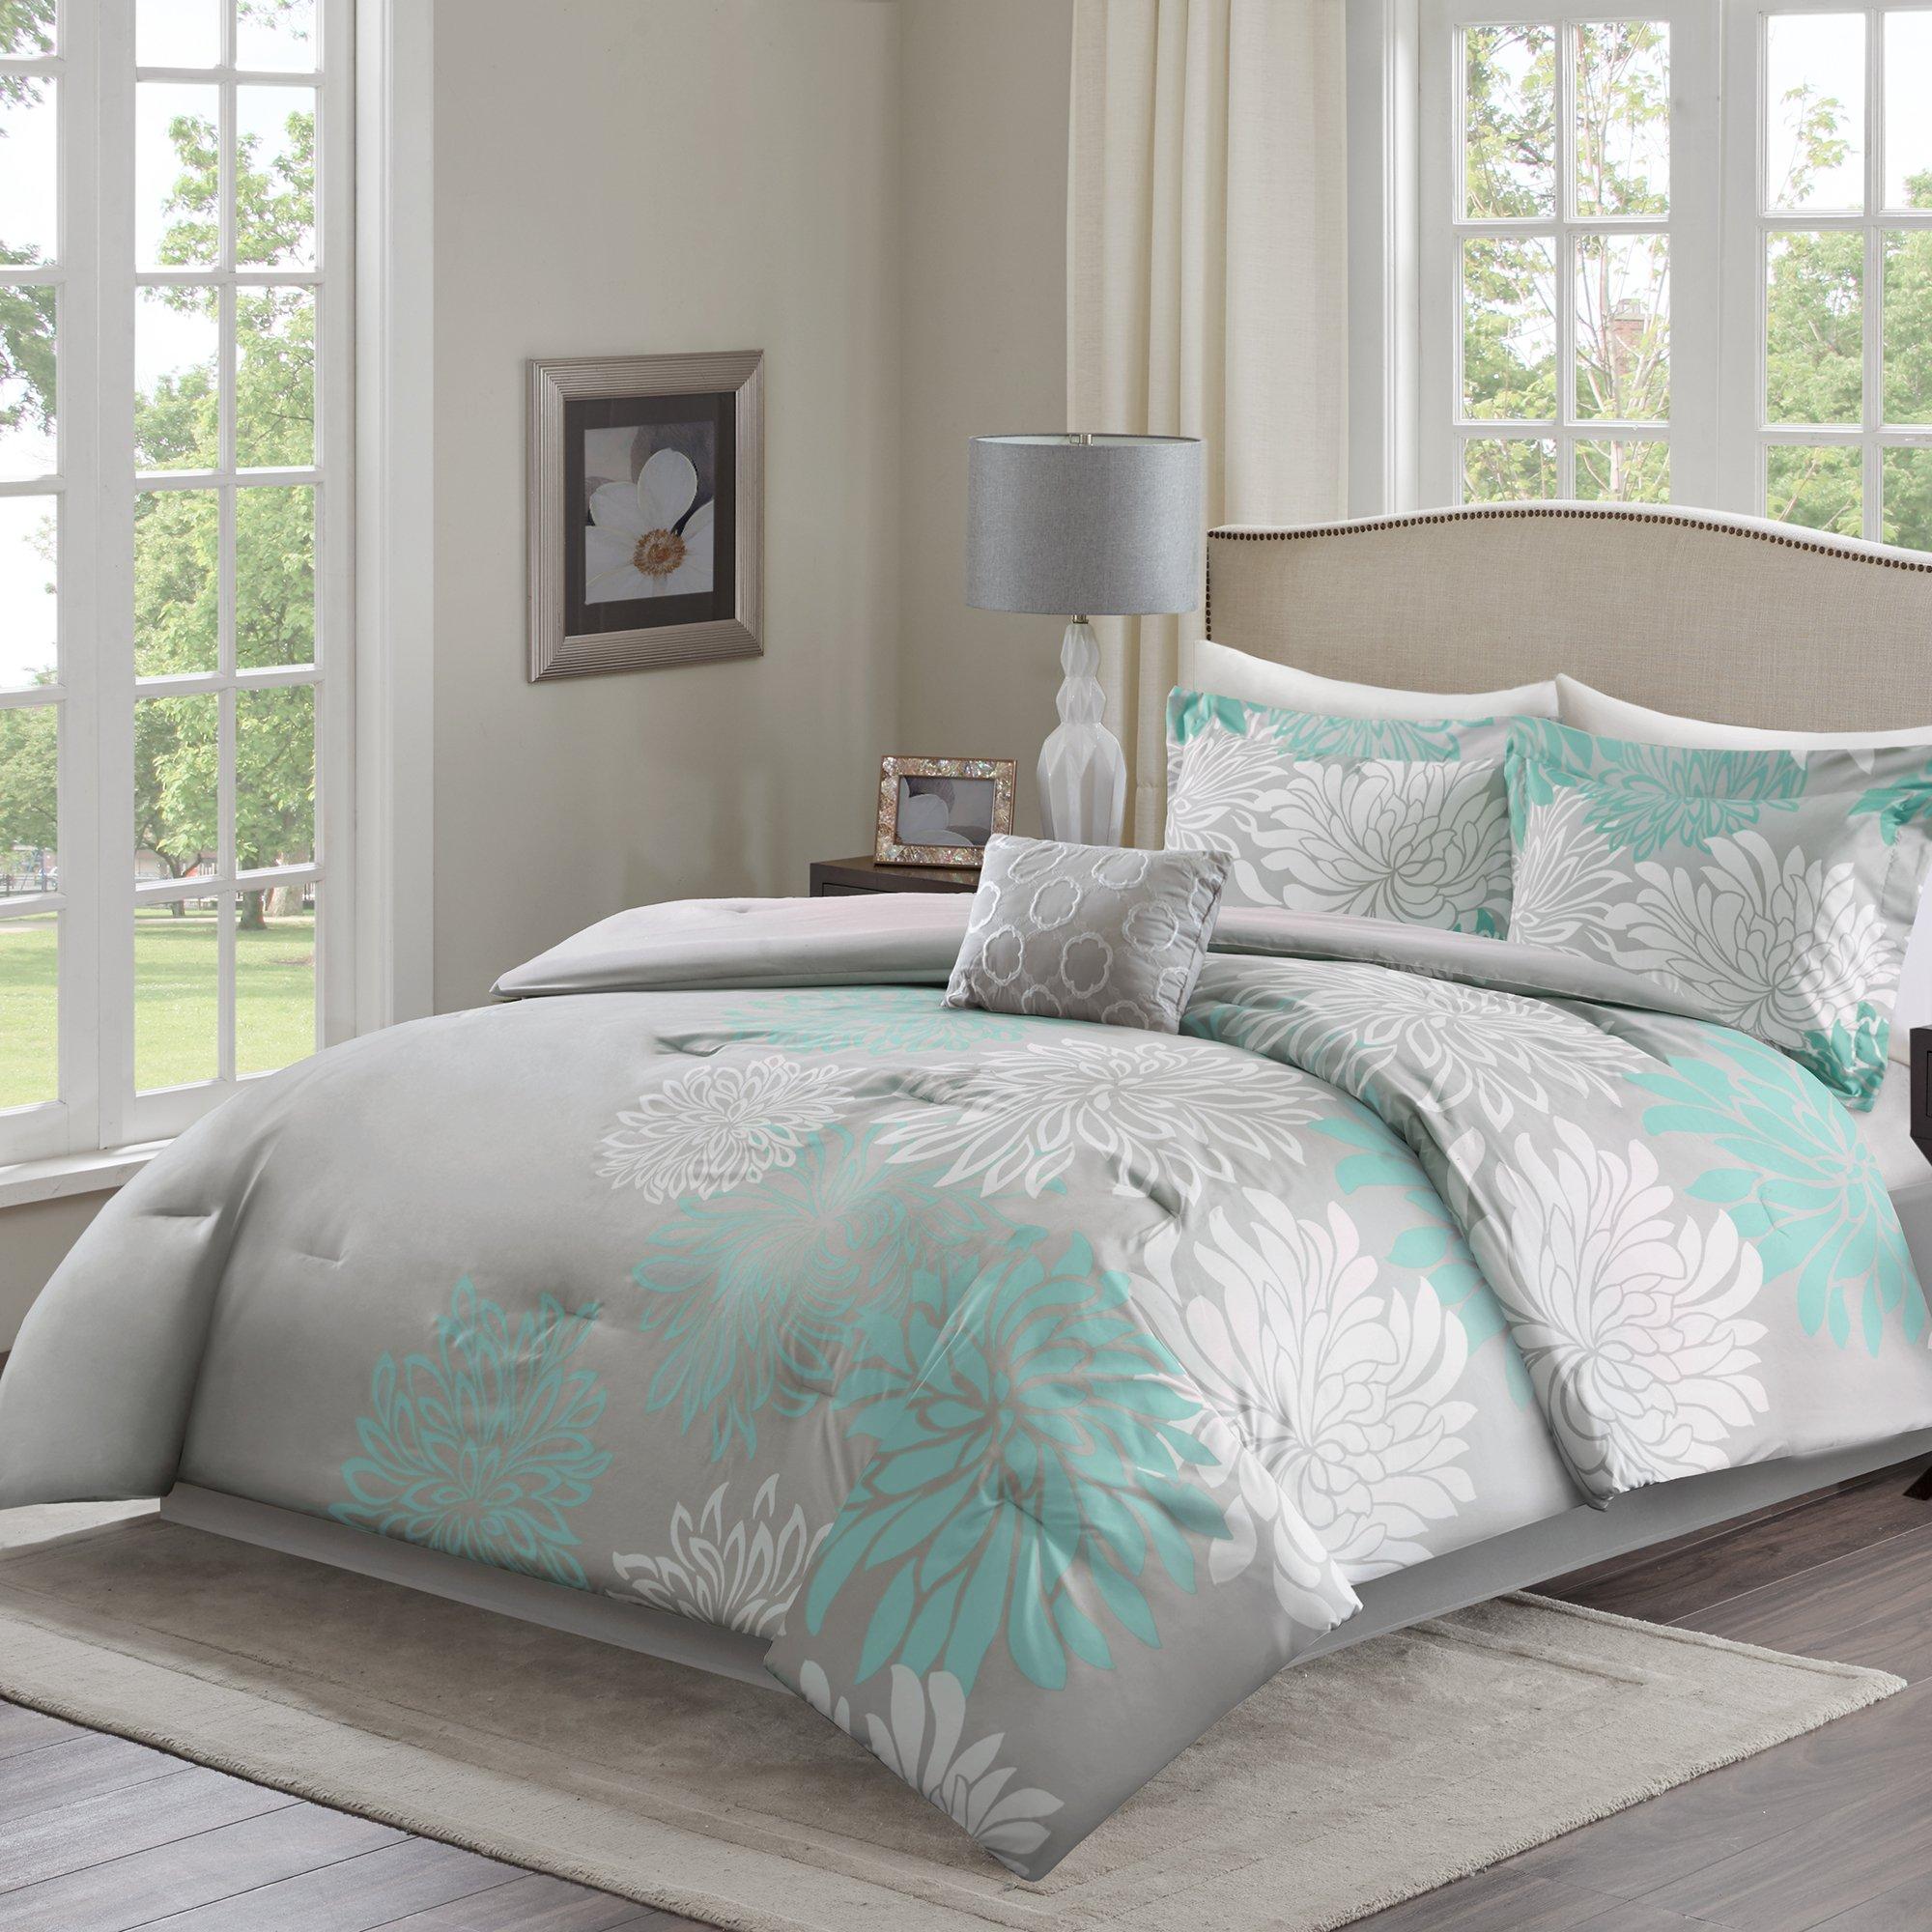 Comfort Spaces – Enya Comforter Set - 5 Piece – Aqua, Grey – Floral Printed – Full/Queen Size, Includes 1 Comforter, 2 Shams, 1 Decorative Pillow, 1 Bed Skirt